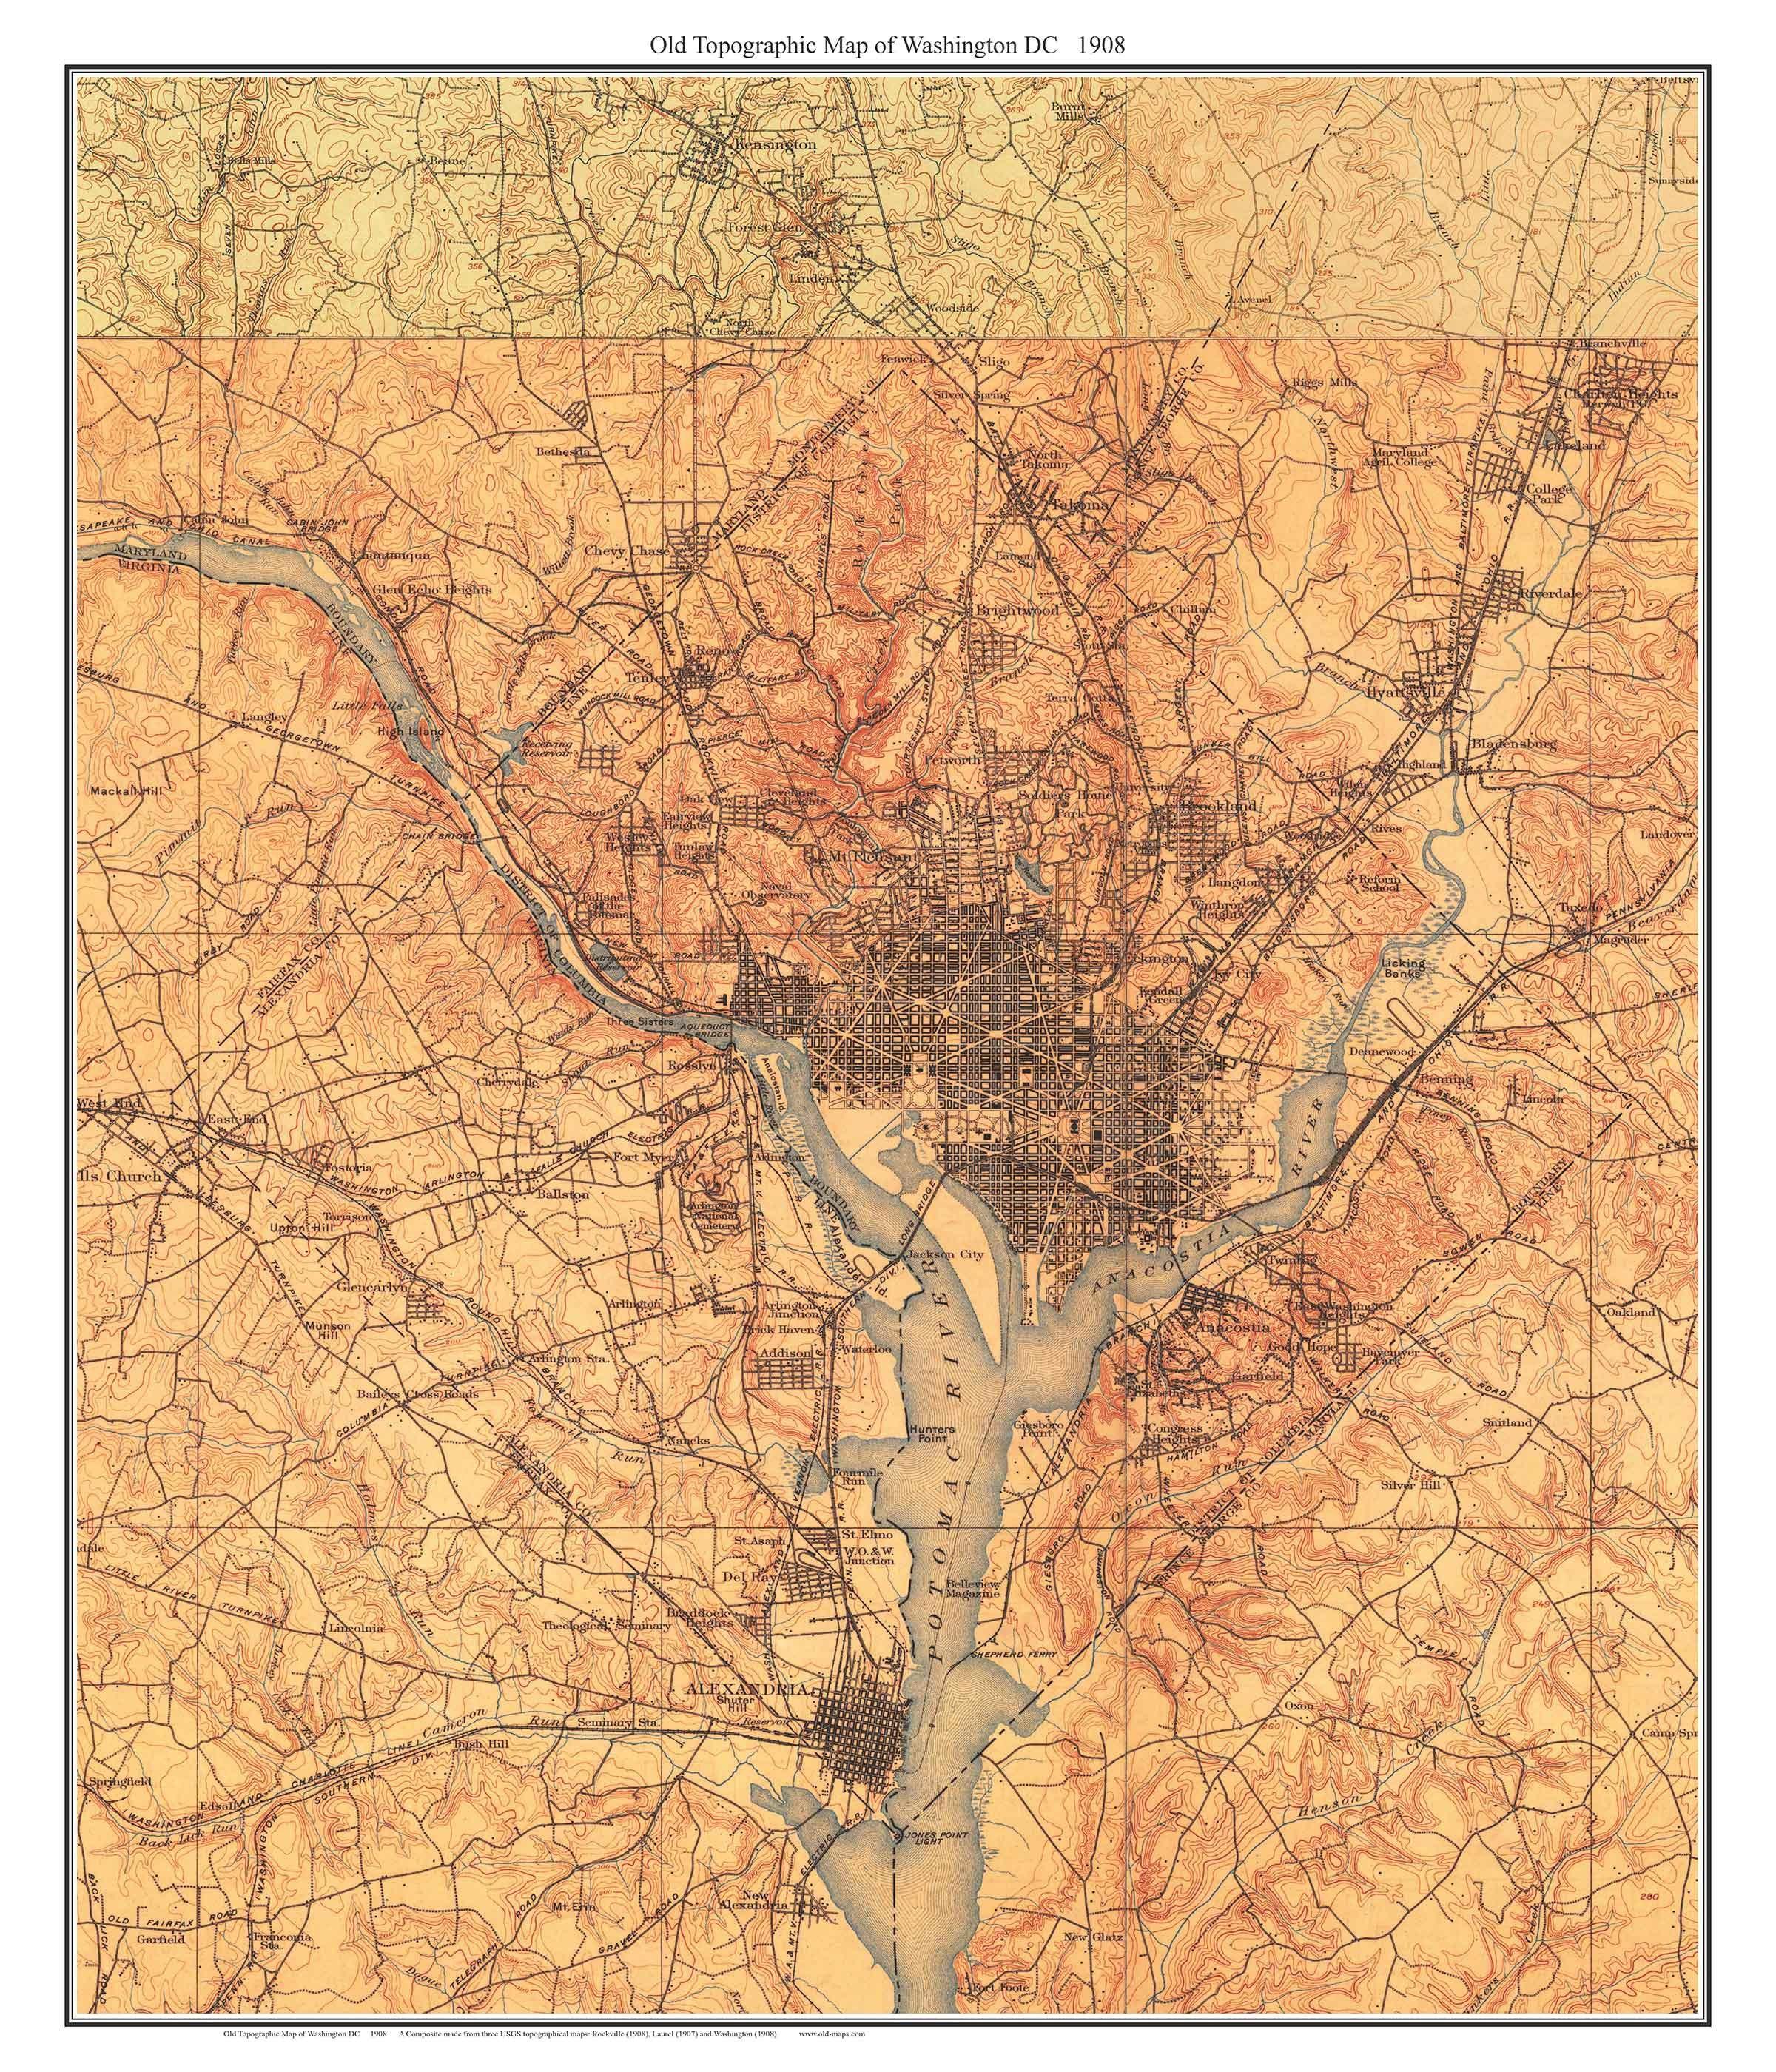 Topographic Map Washington Dc.Washington Dc 1908 Old Topographic Map Usgs Custom Composite Etsy